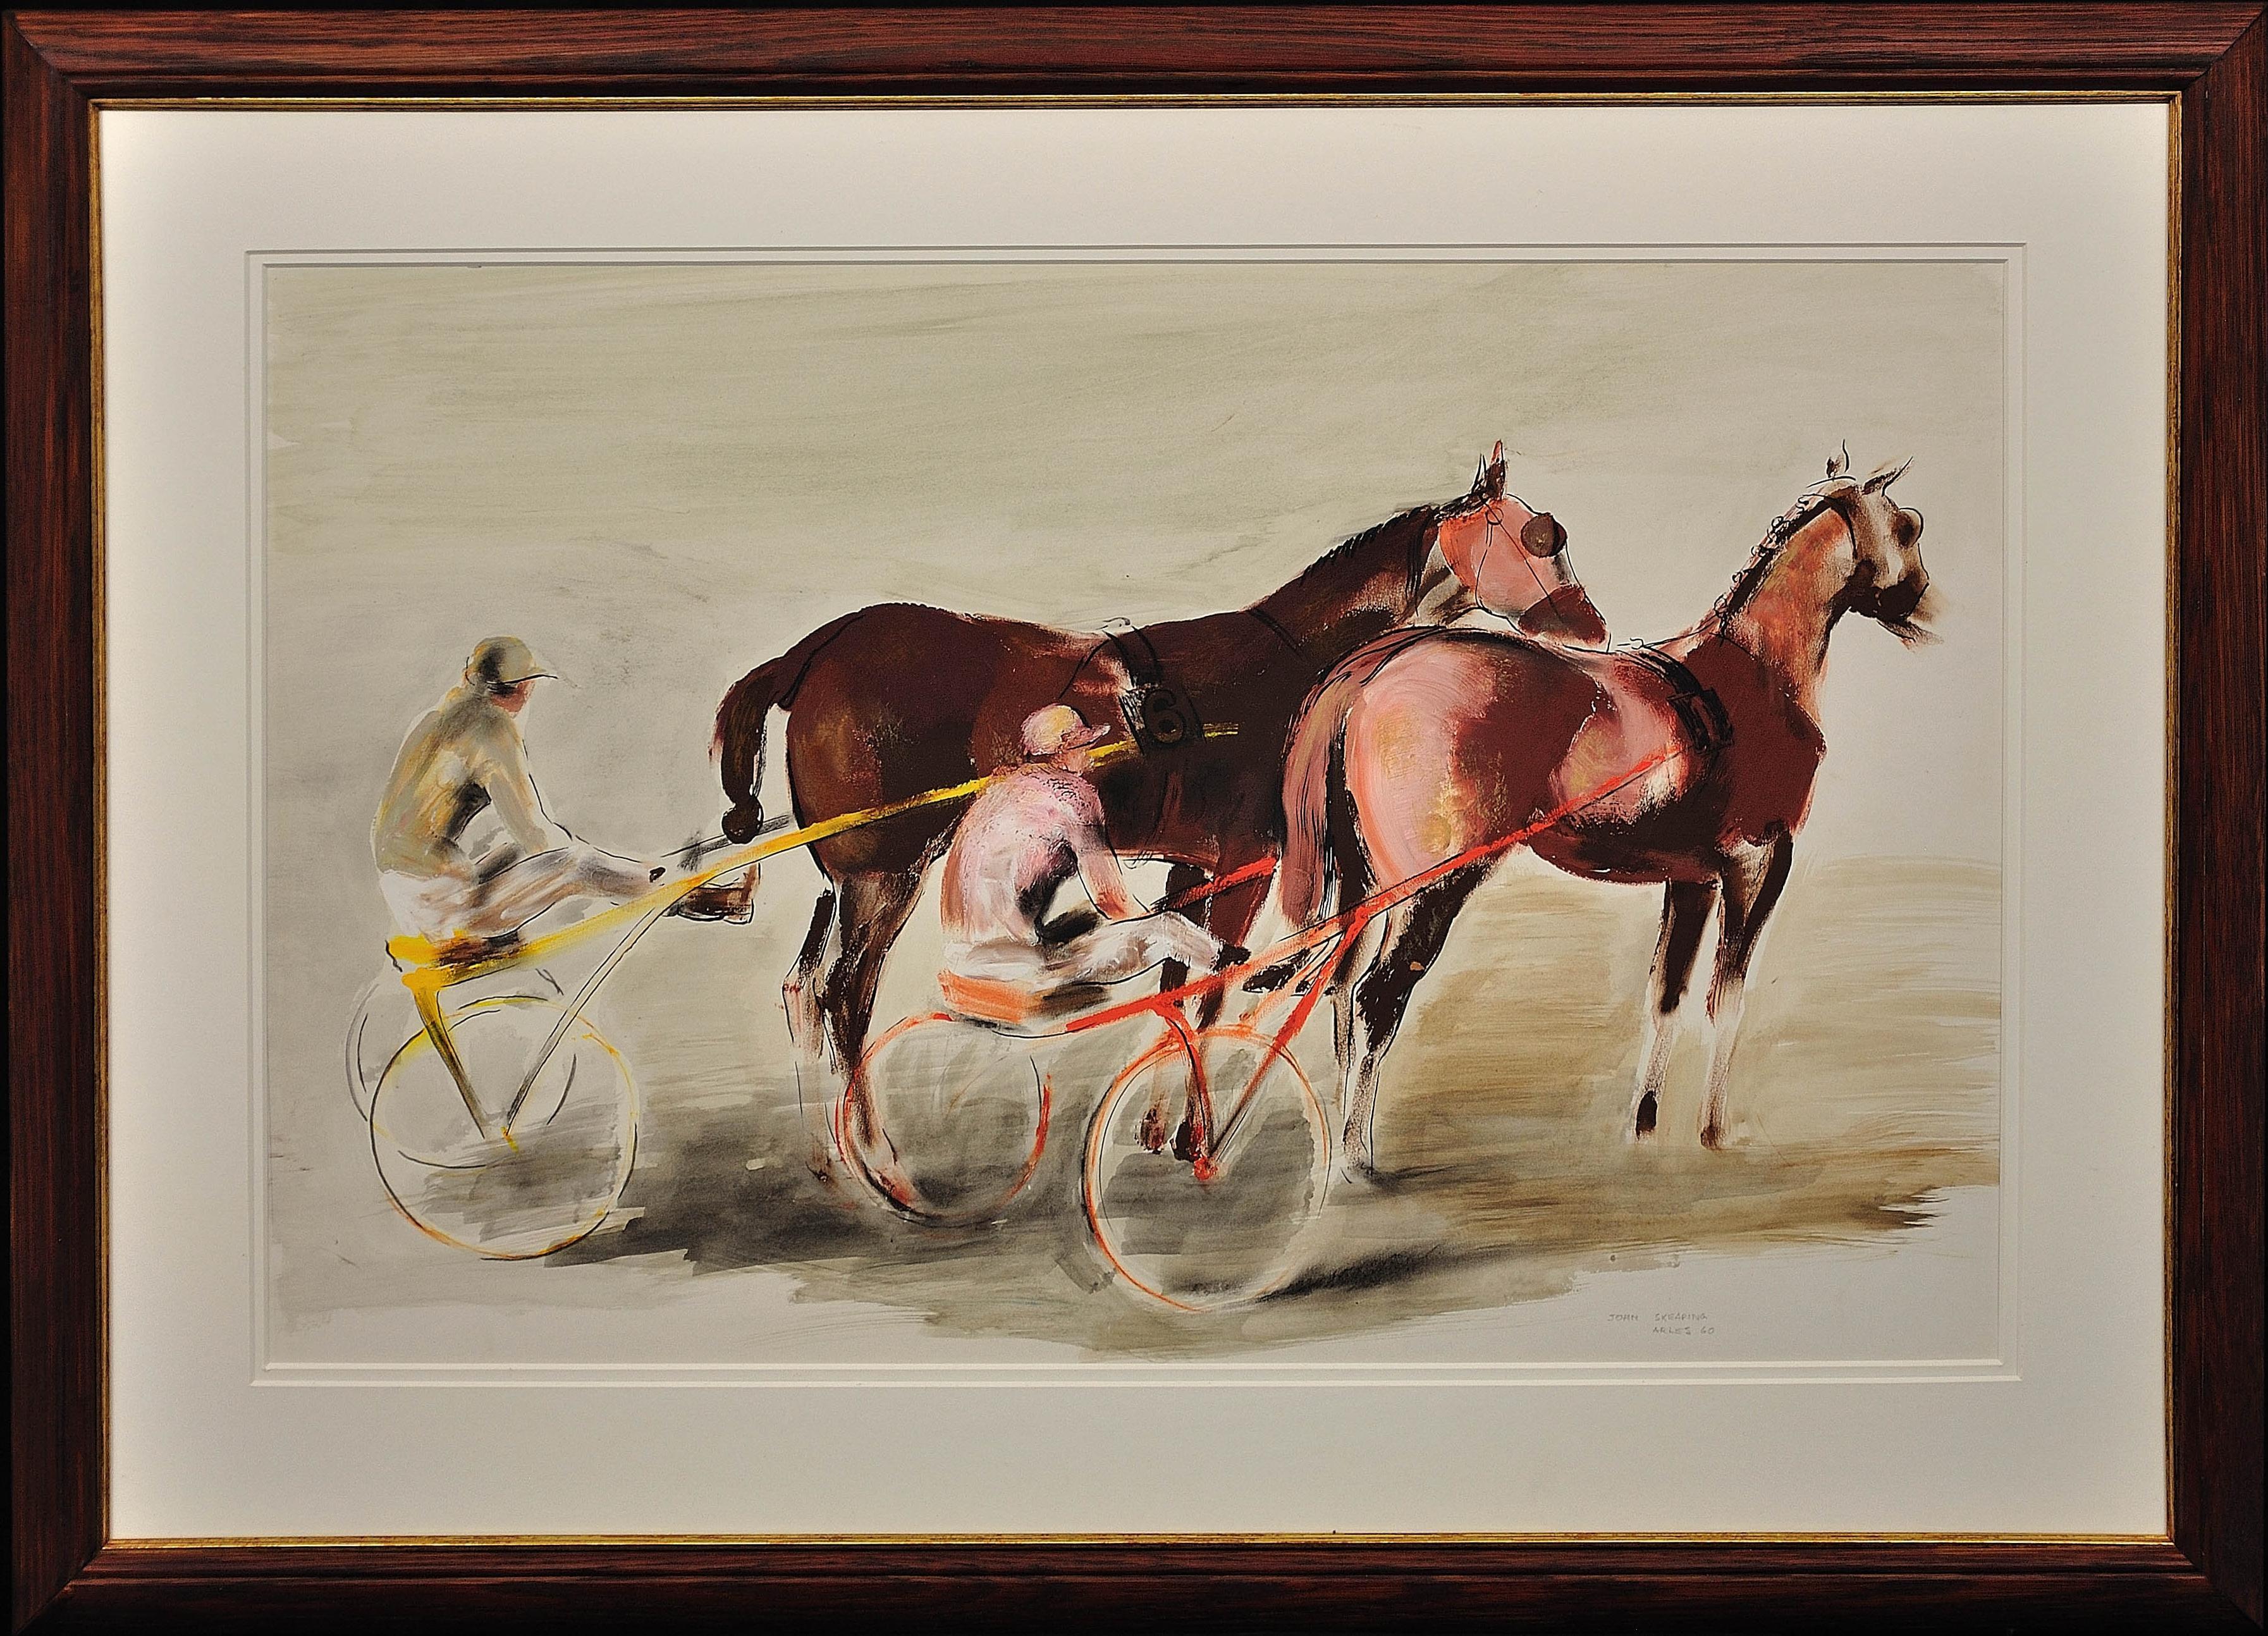 Harness Racing, Arles, France, 1960. Equine.Sulky. Driver.Jockeys. Racehorses.